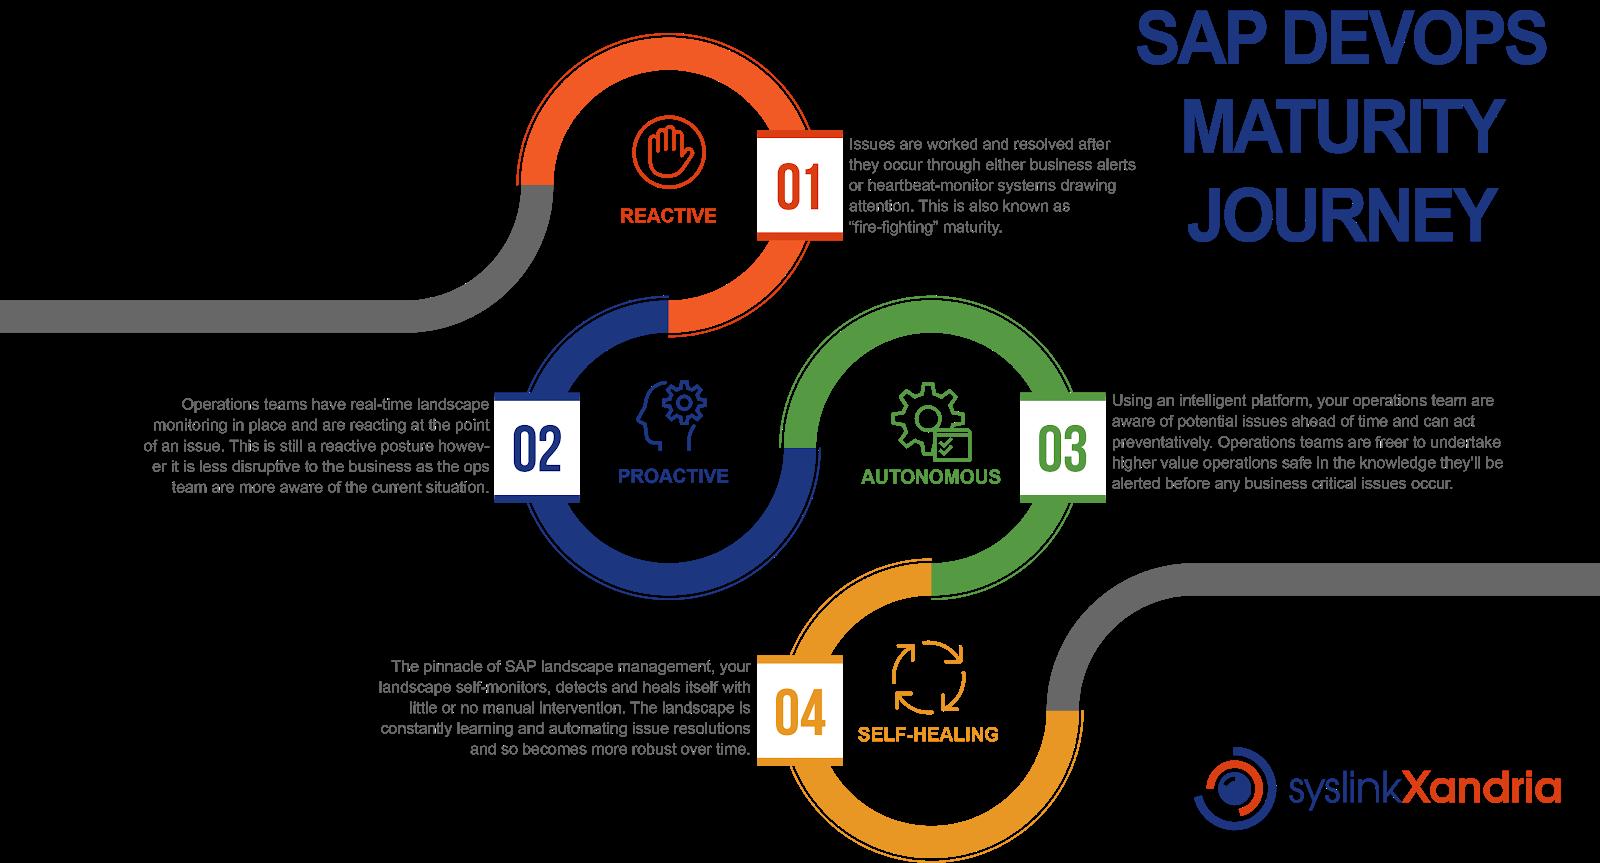 SAP DevOps Maturity Journey